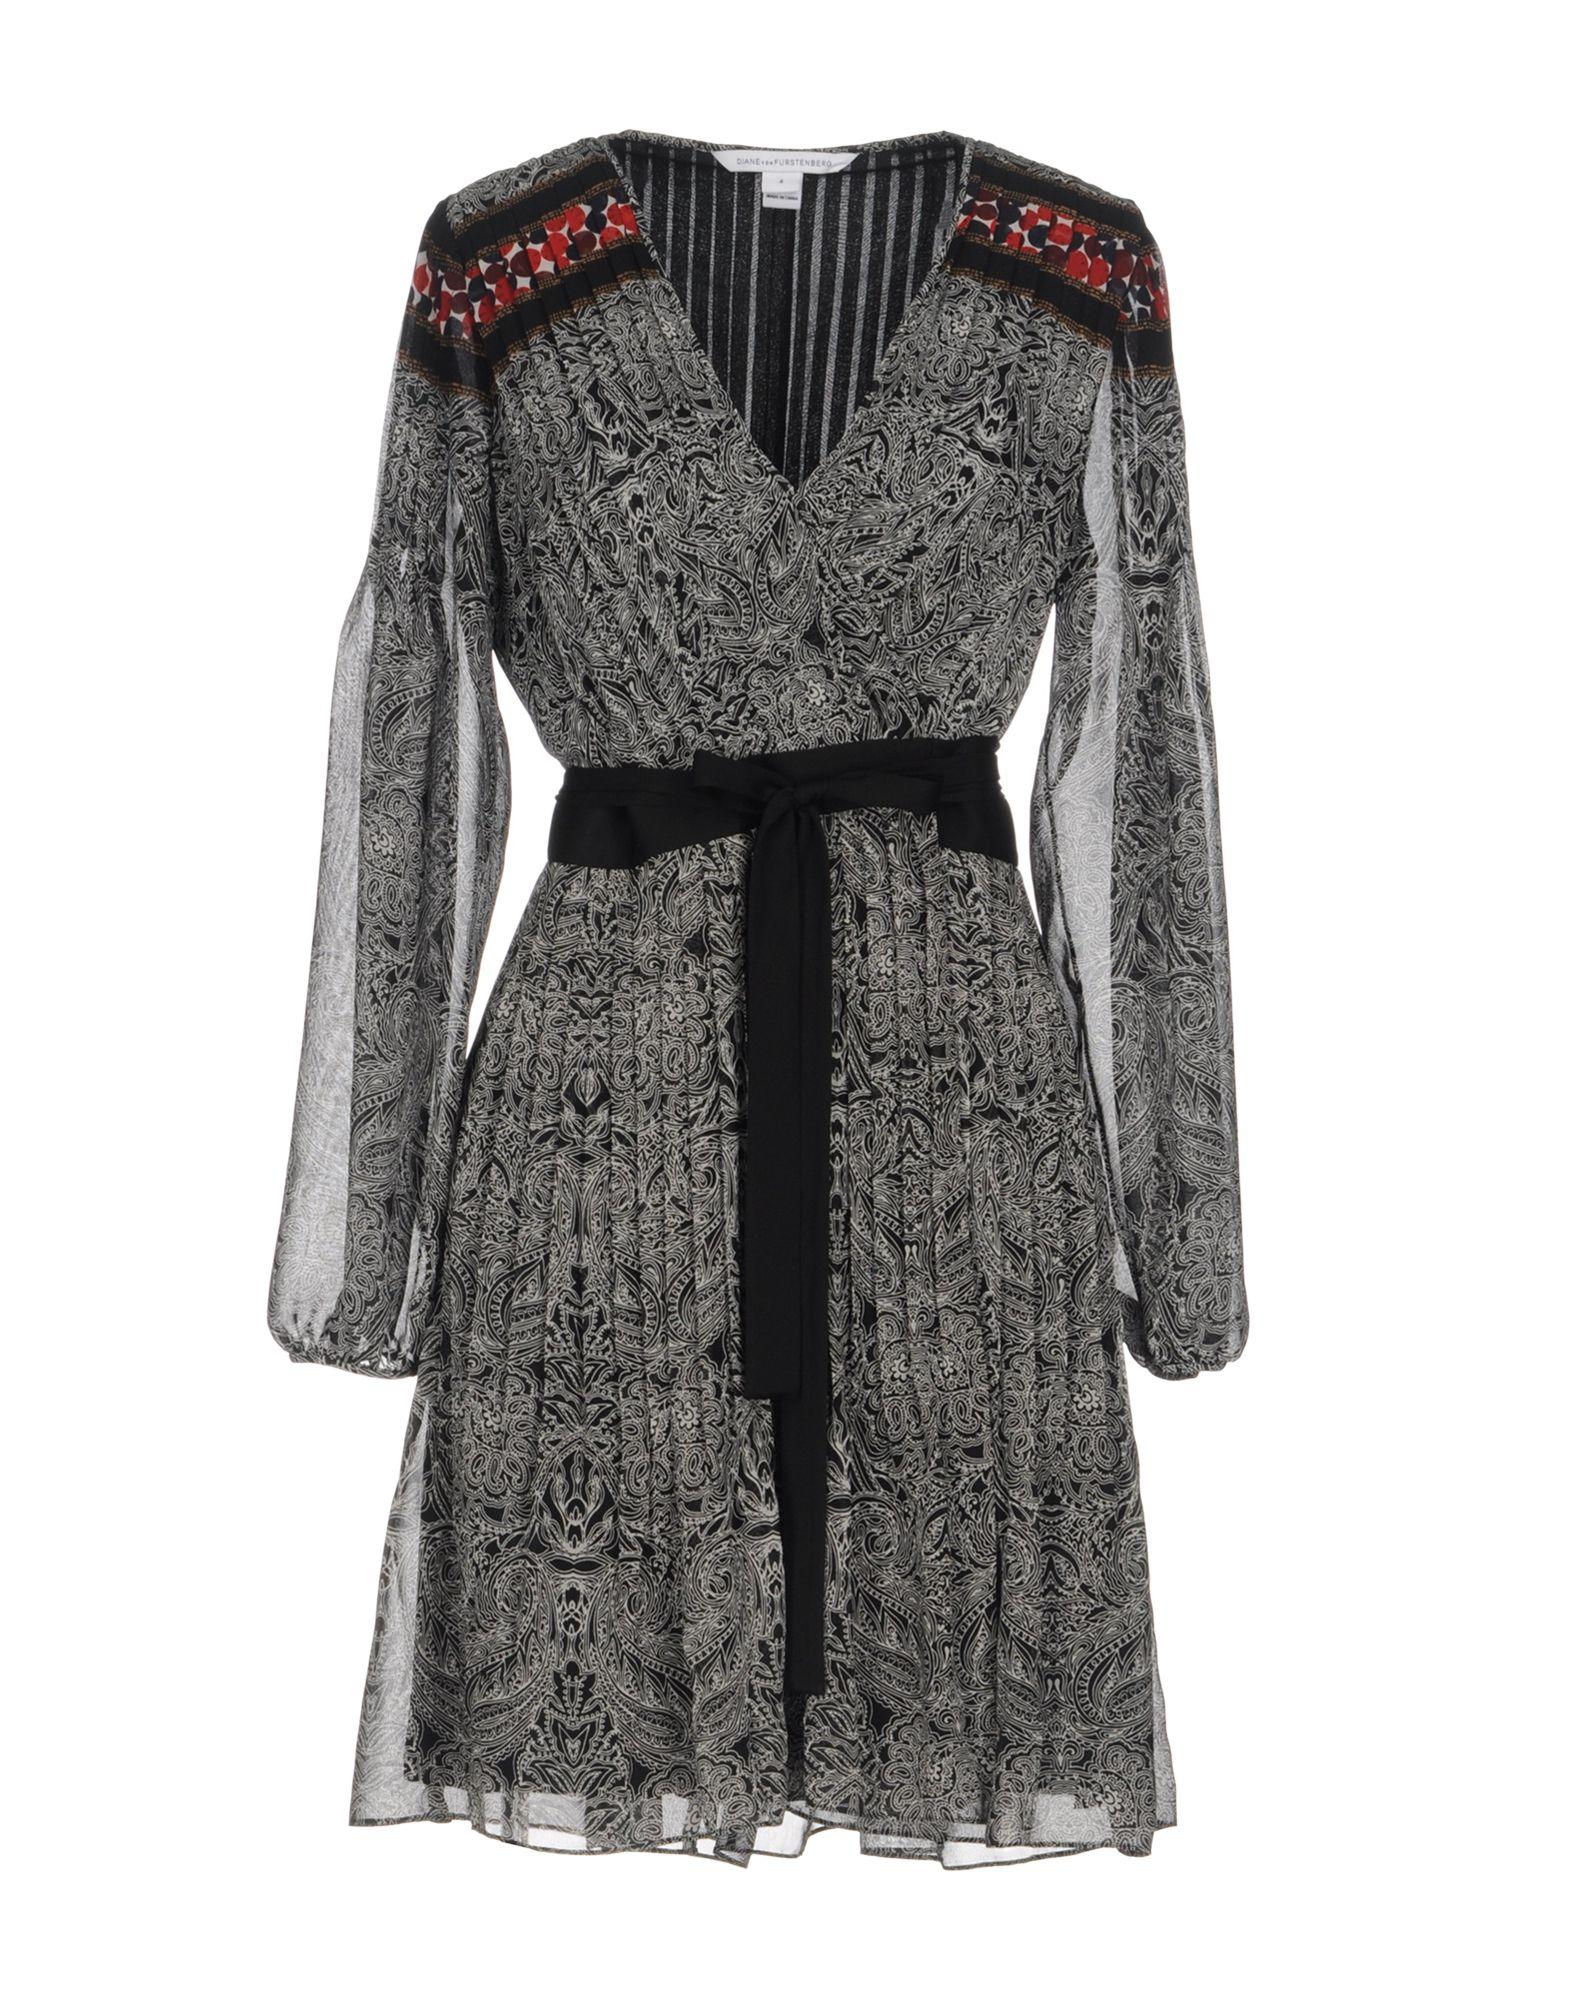 DIANE VON FURSTENBERG Короткое платье комплект постельного белья ecotex 2 х сп сатин жаккард николетта кэмниколетта